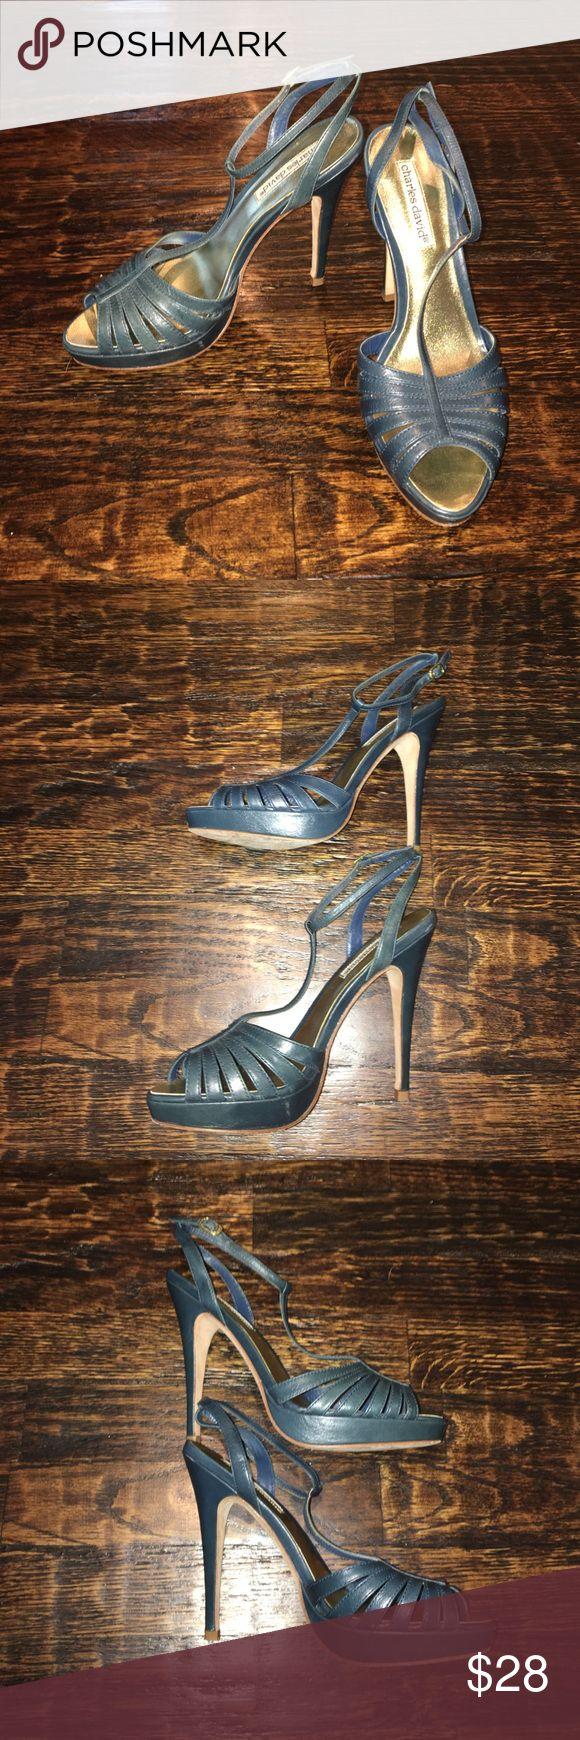 Charles David Teel Heels Stunning Charles David teel leather heels. In great condition. Heel measures 4 1/2 inches. Charles David Shoes Heels